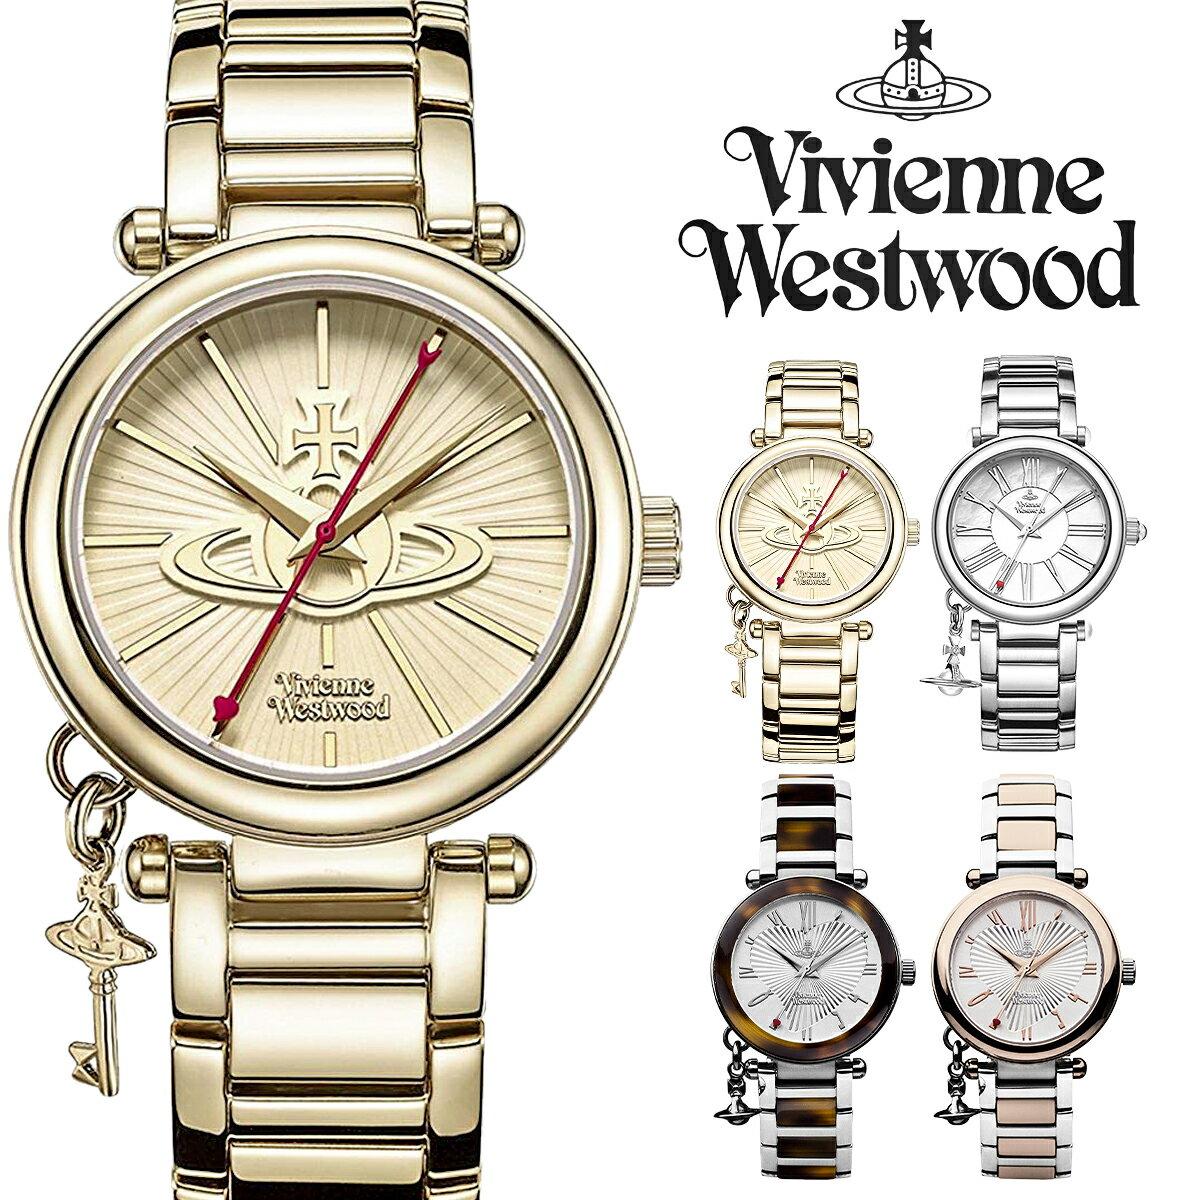 【P最大19倍!当店エントリー!】 ヴィヴィアンウエストウッド VIVIENNE WESTWOOD ORB オーブ レディース 時計 腕時計 クオーツ